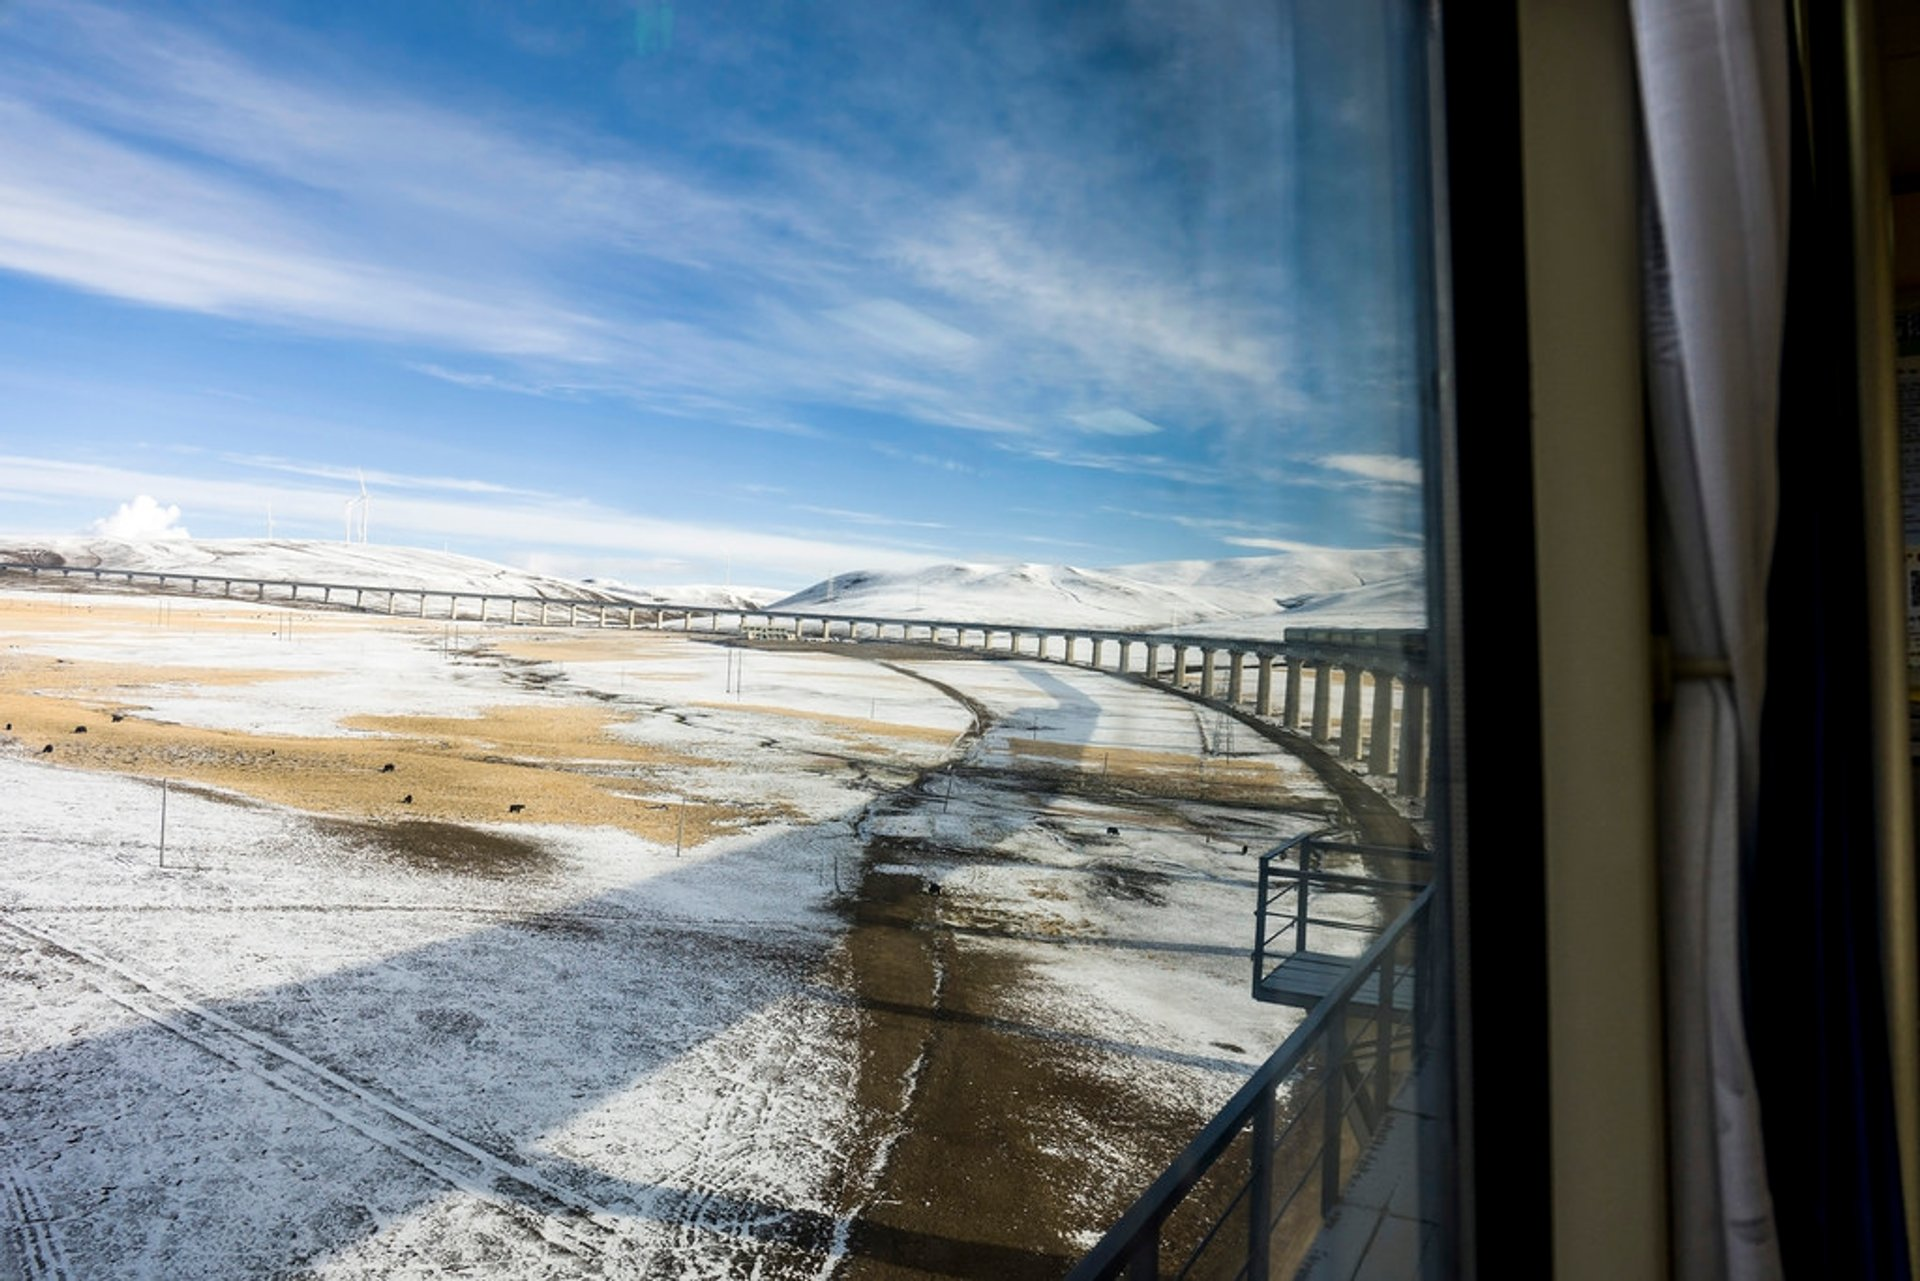 Qinghai-Tibet Railway in Tibet - Best Season 2020